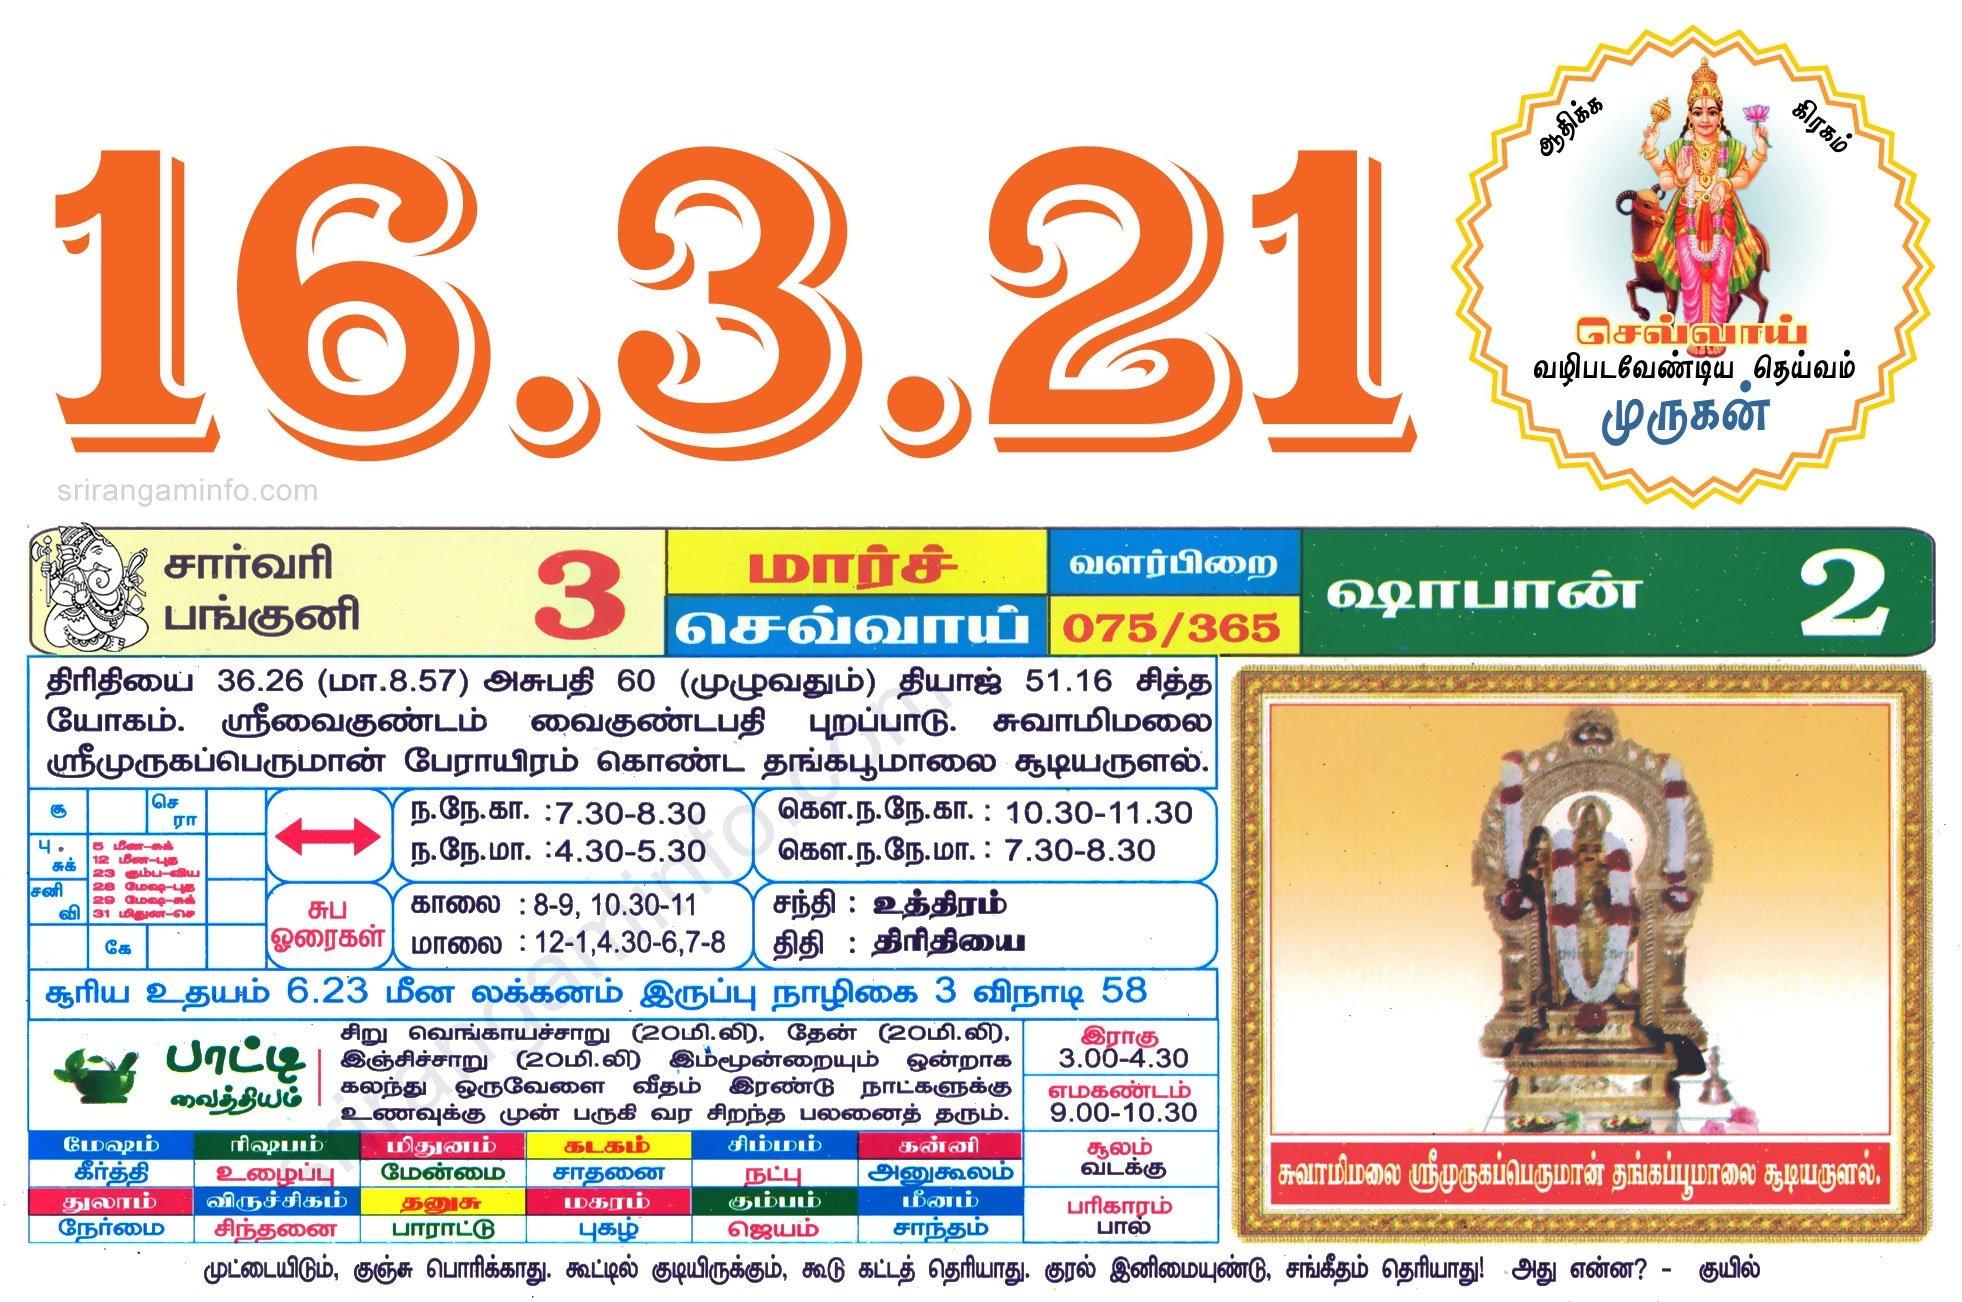 Tamil Daily Calendar 2021, Tamil Calendar 2021, Nalla Neram - தமிழ் தினசரி காலண்டர் within 2021 Tamil Calendar Holidays